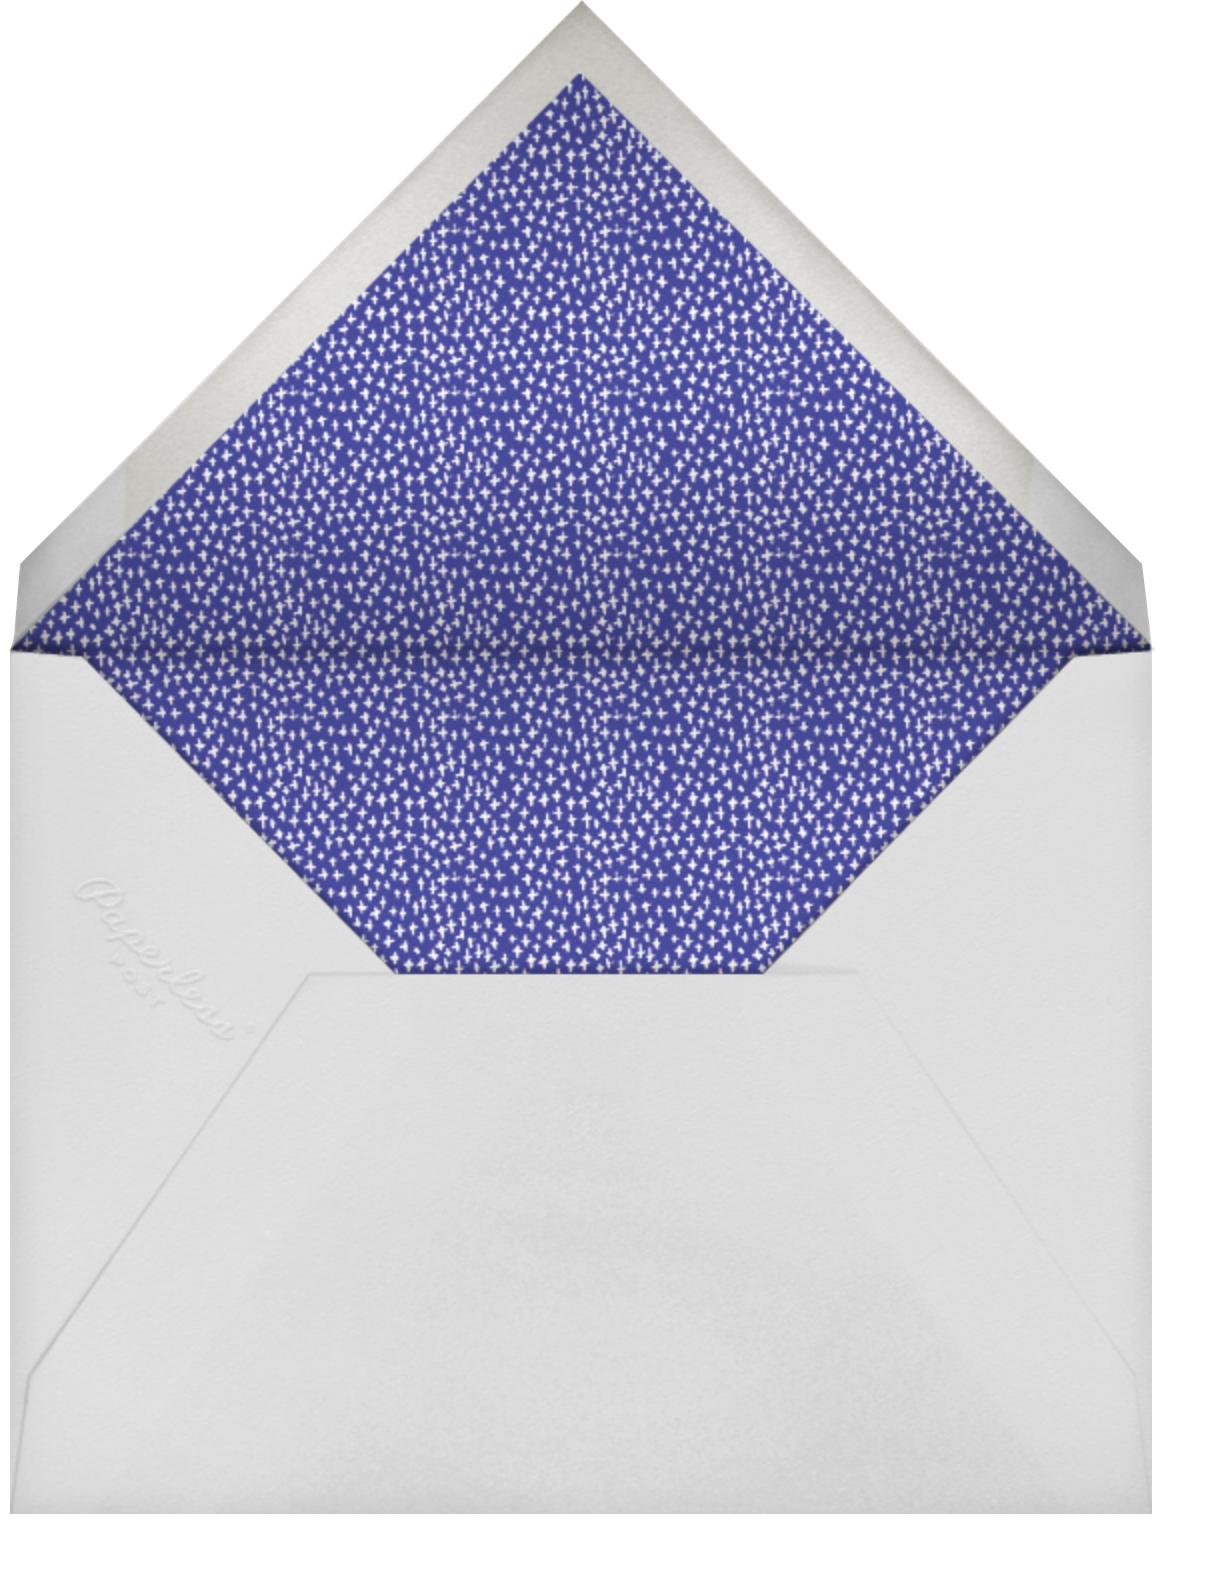 Penciled Garden - Mr. Boddington's Studio - Bridal shower - envelope back